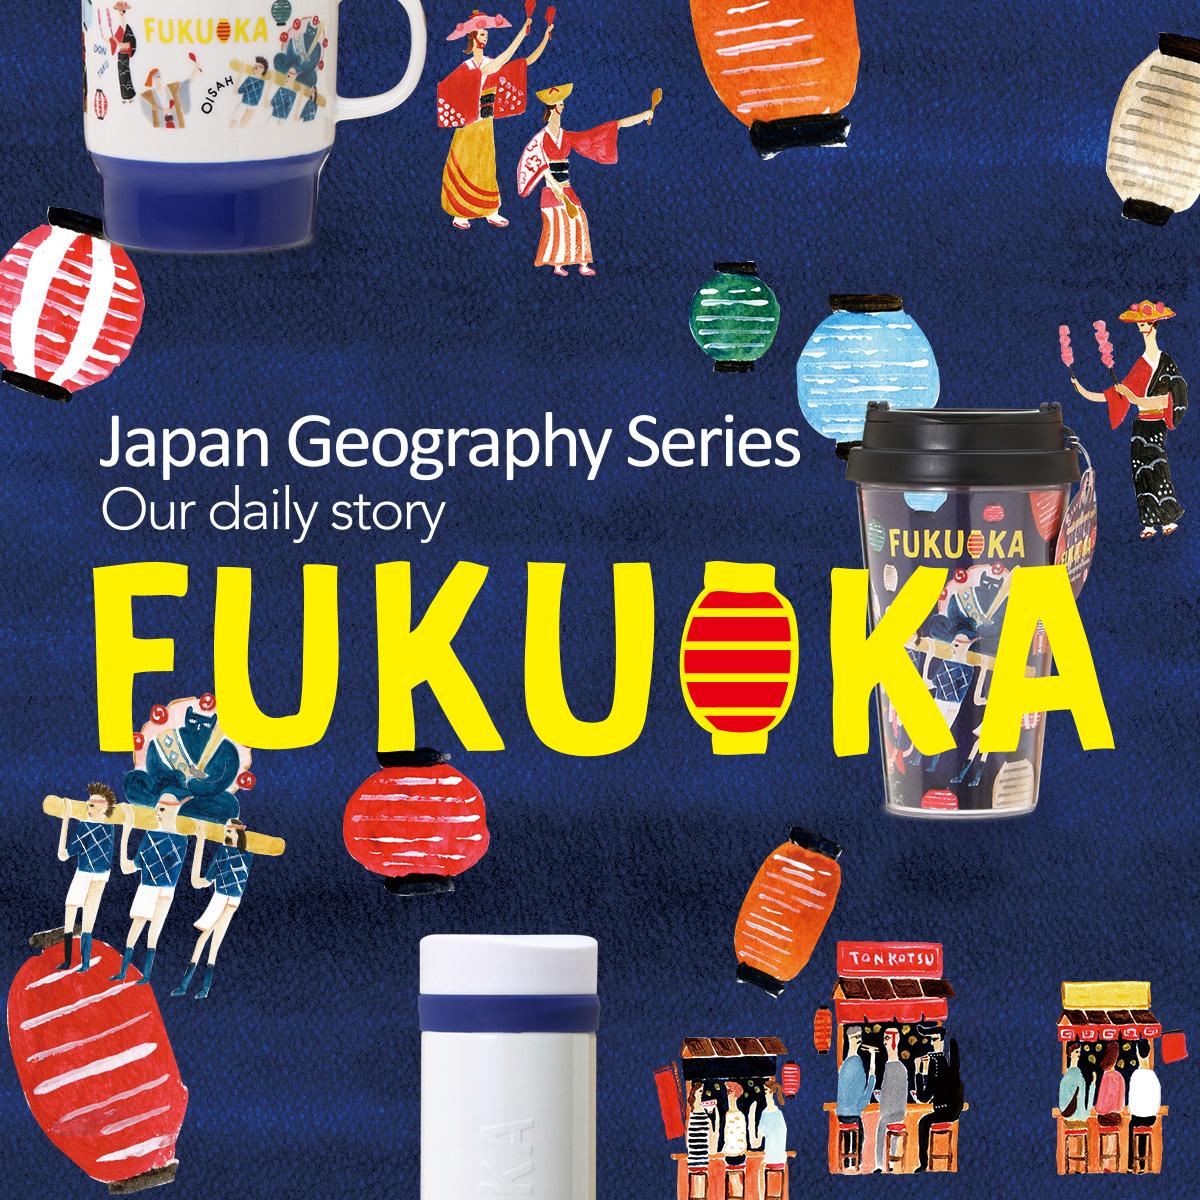 Japan Geography Series 福岡